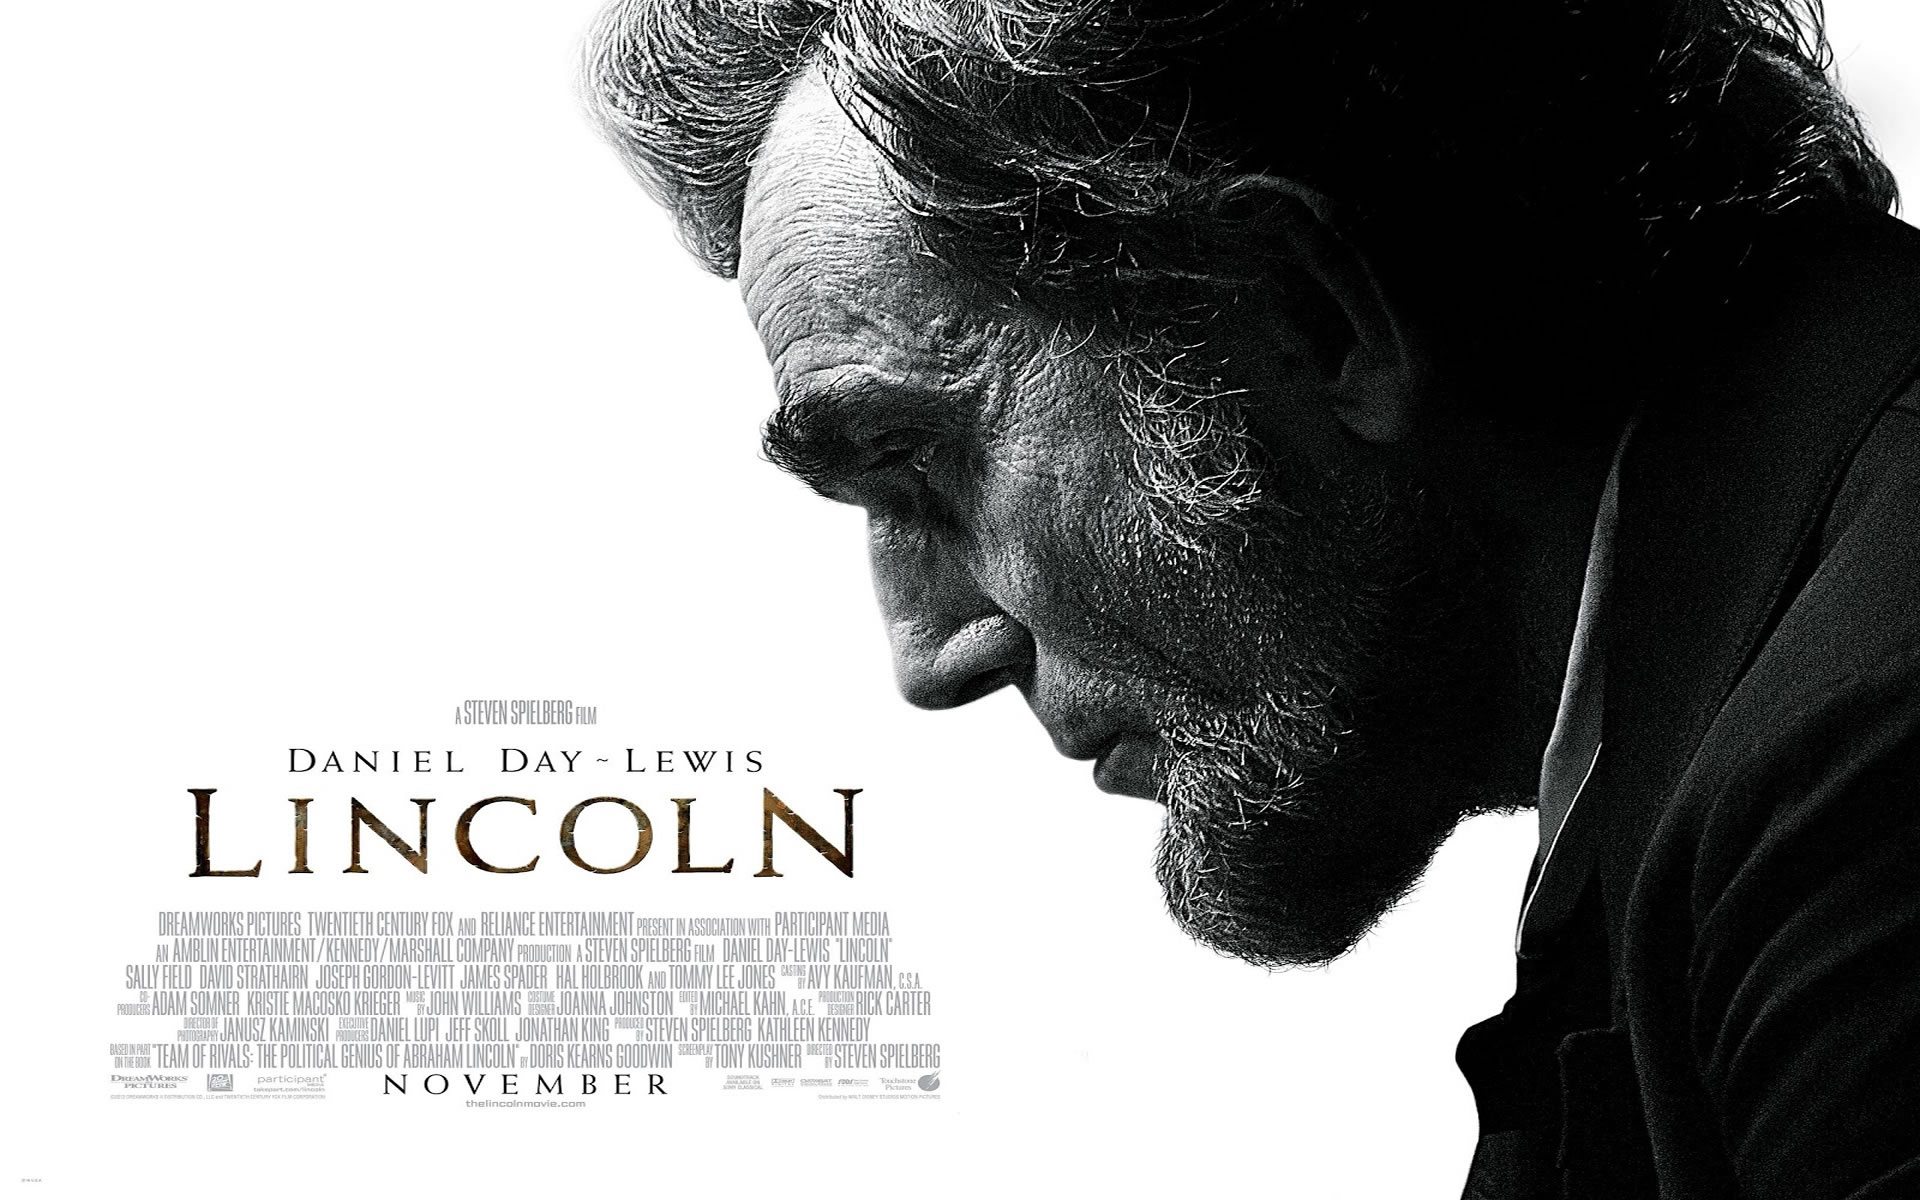 Fondos de Cine. Lincoln